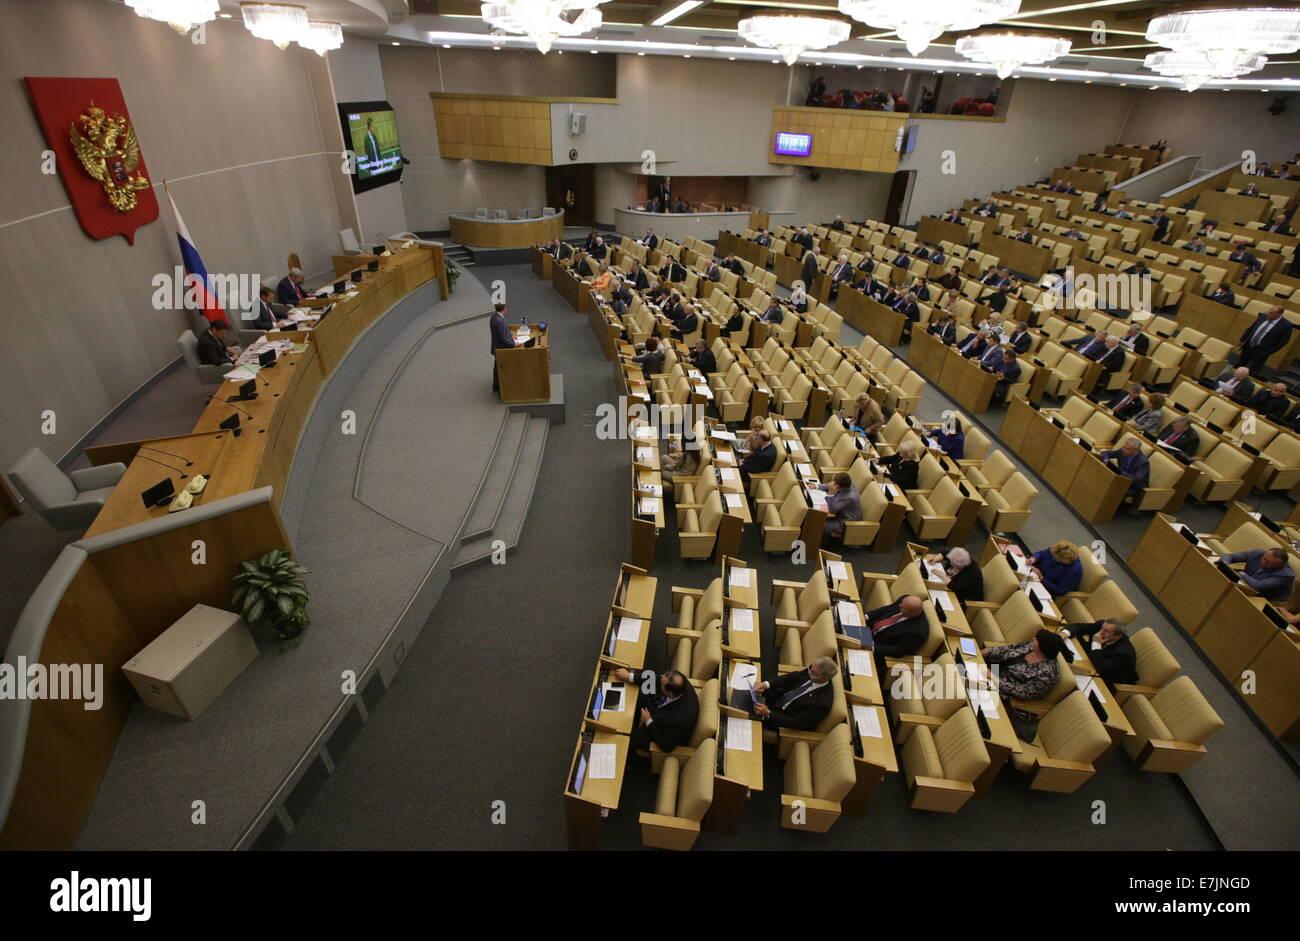 ITAR-TASS: MOSCOW, RUSSIA. SEPTEMBER 19, 2014. A State Duma plenary meeting. (Photo ITAR-TASS/ Stanislav Krasilnikov) Stock Photo